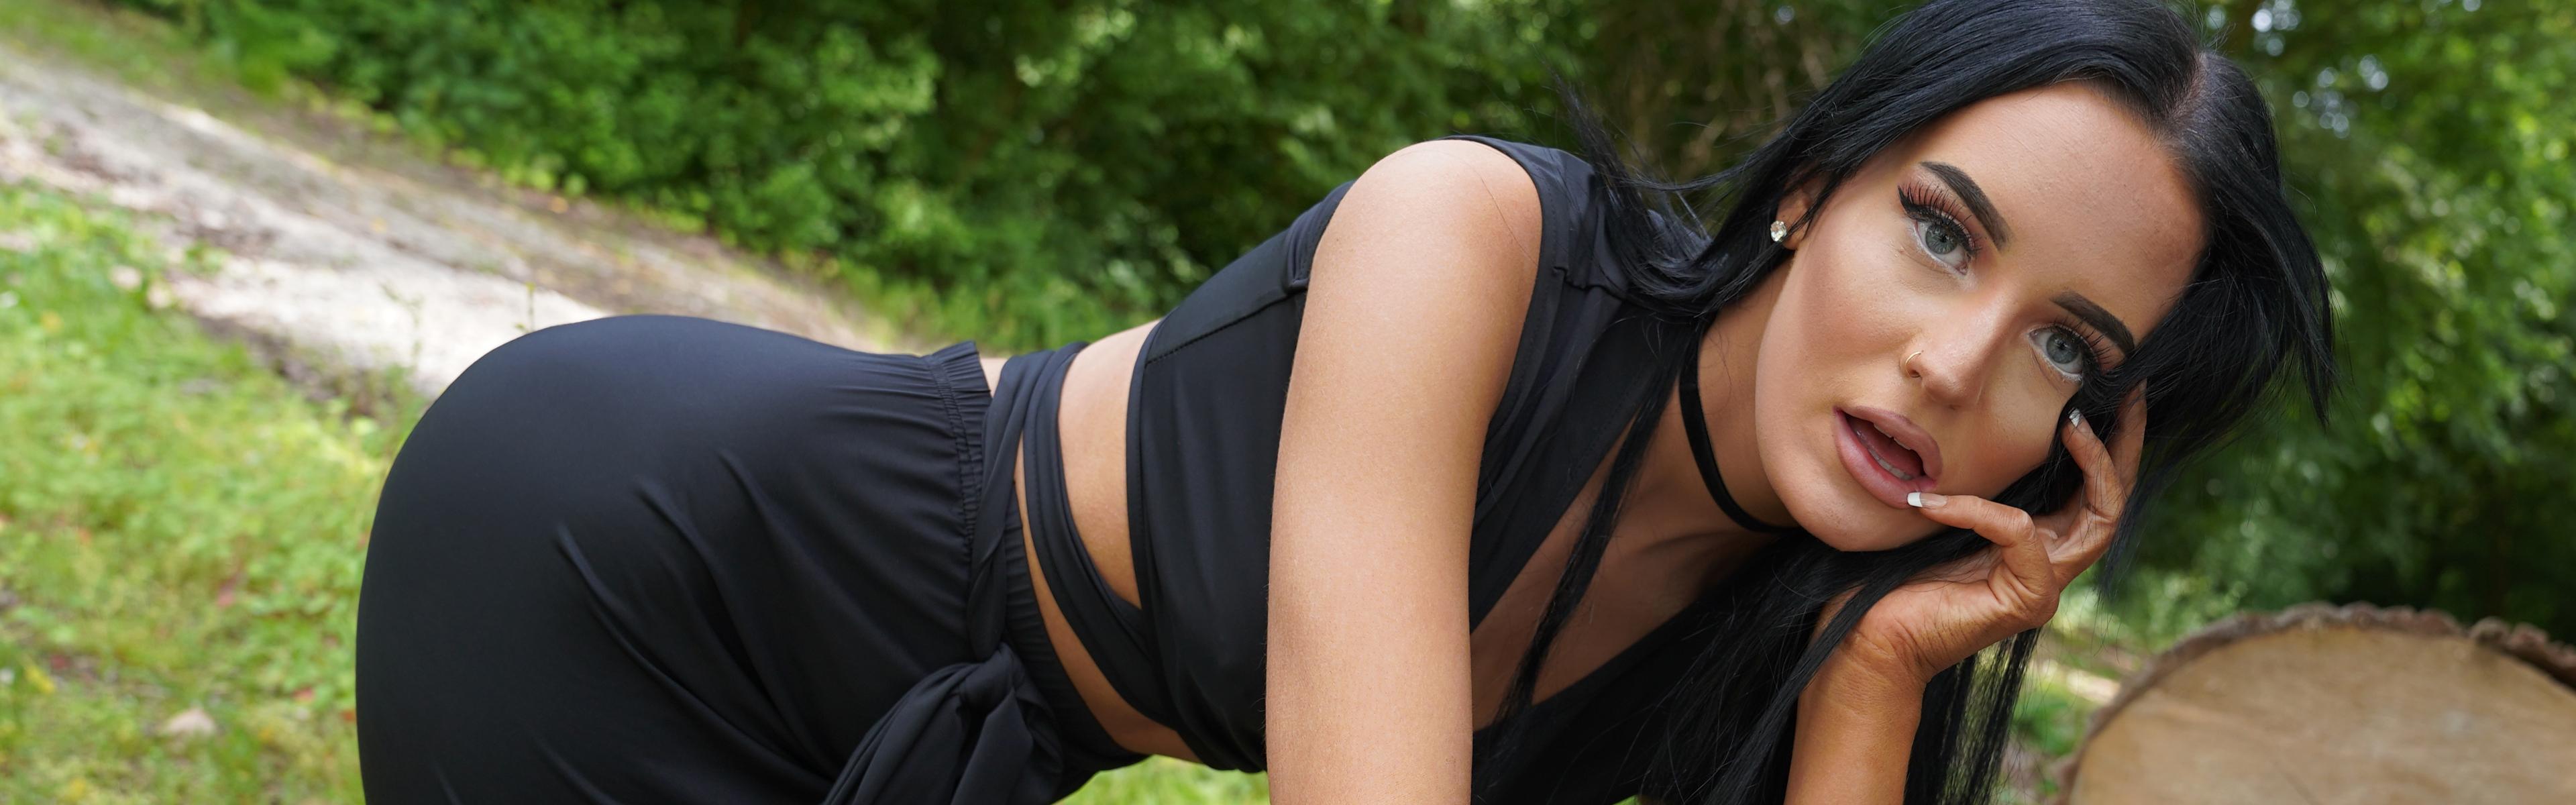 Geile foto van het hete Secret Circle model: Jennifer Steele